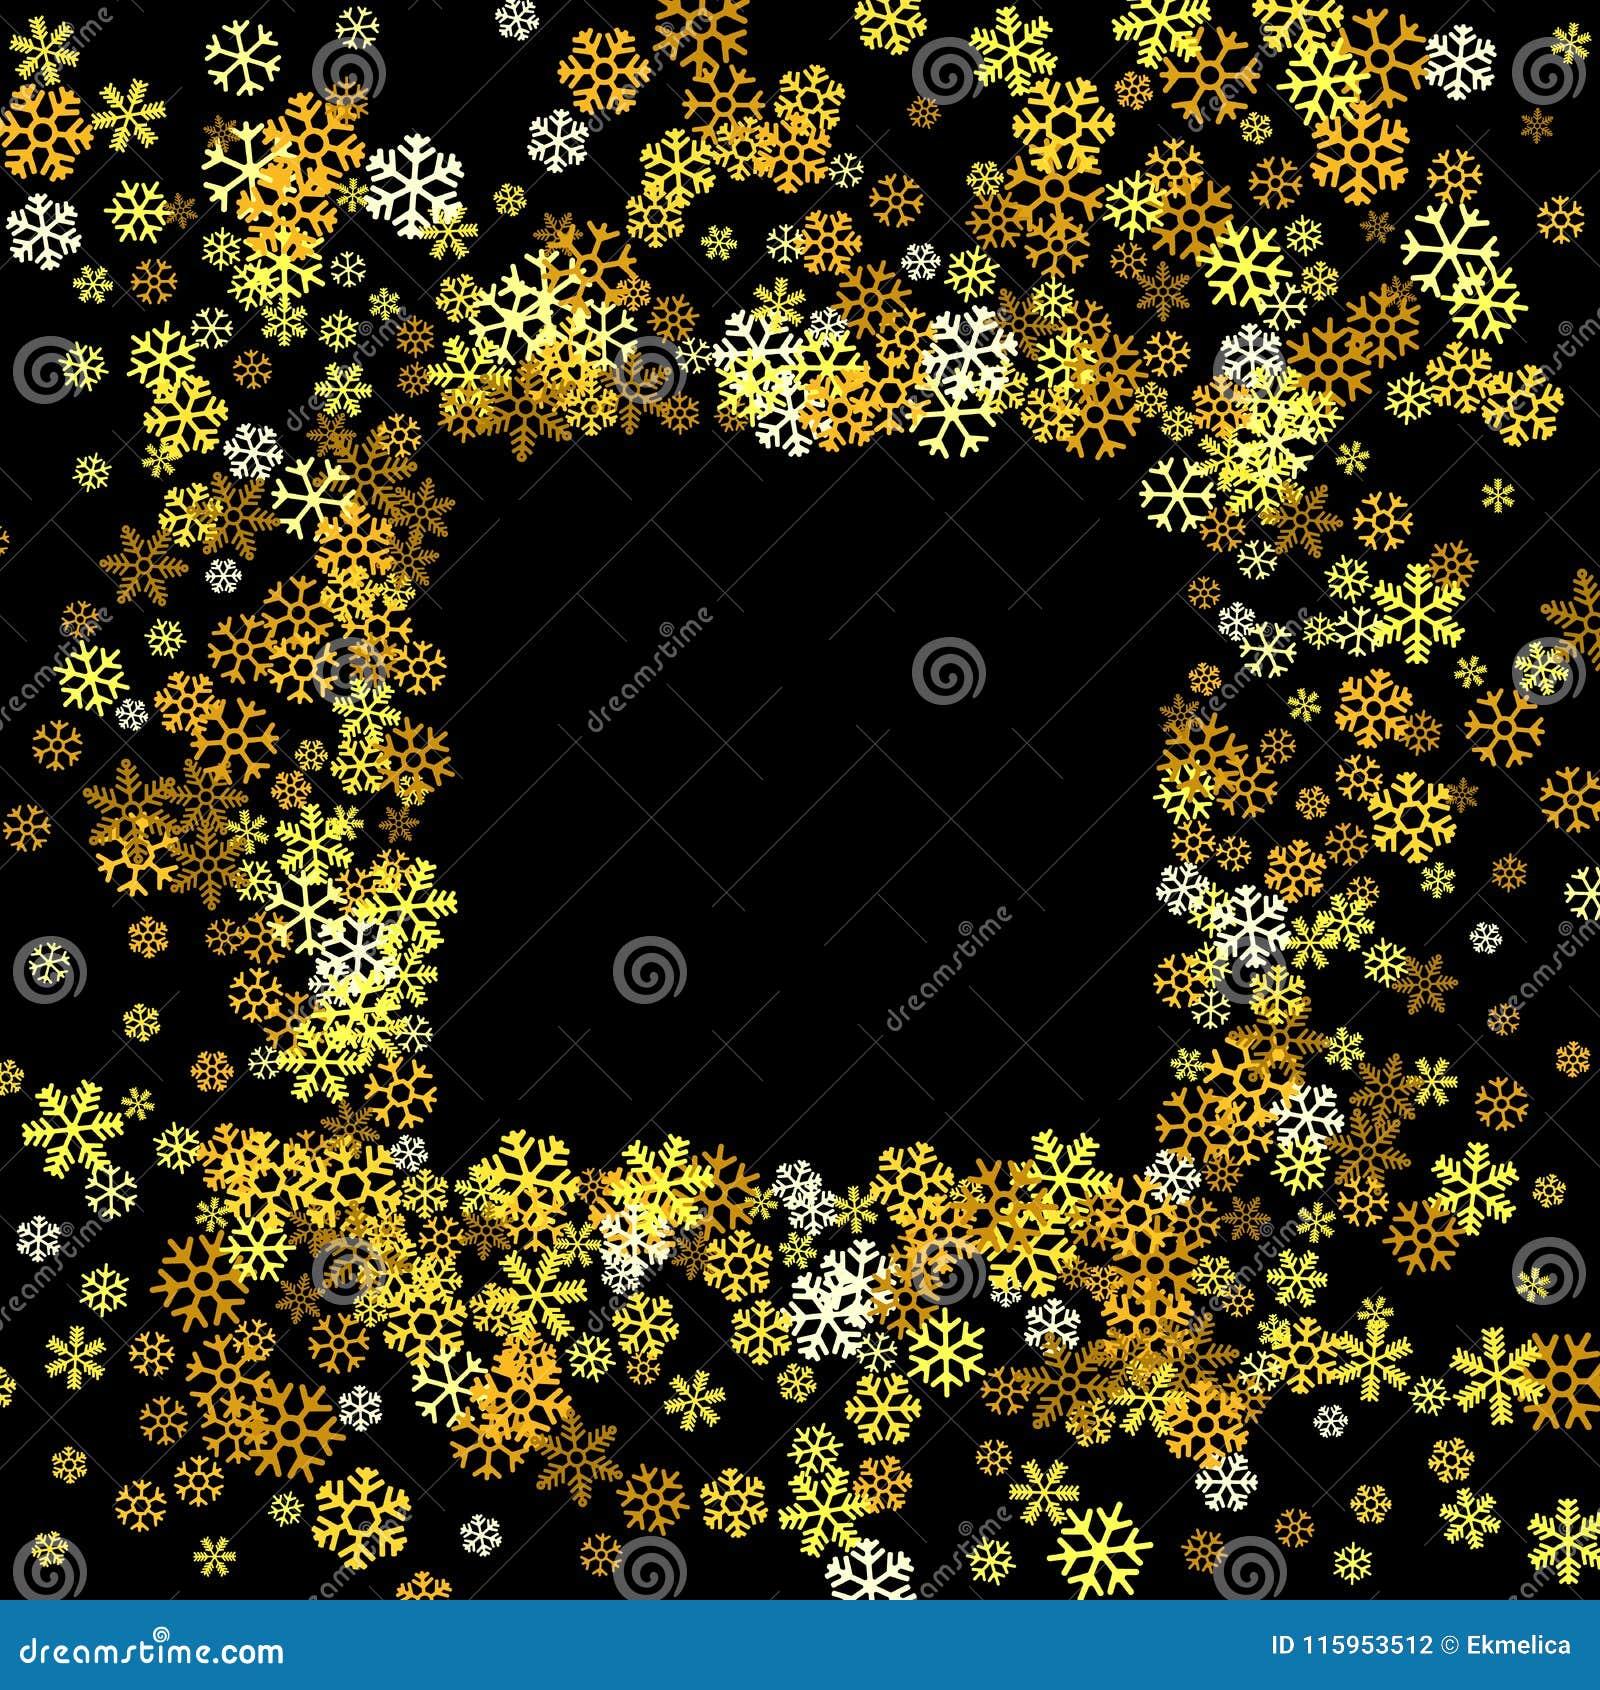 4c895055d3c Square gold frame or border of random scatter golden snowflakes on black  background. Design element for festive banner